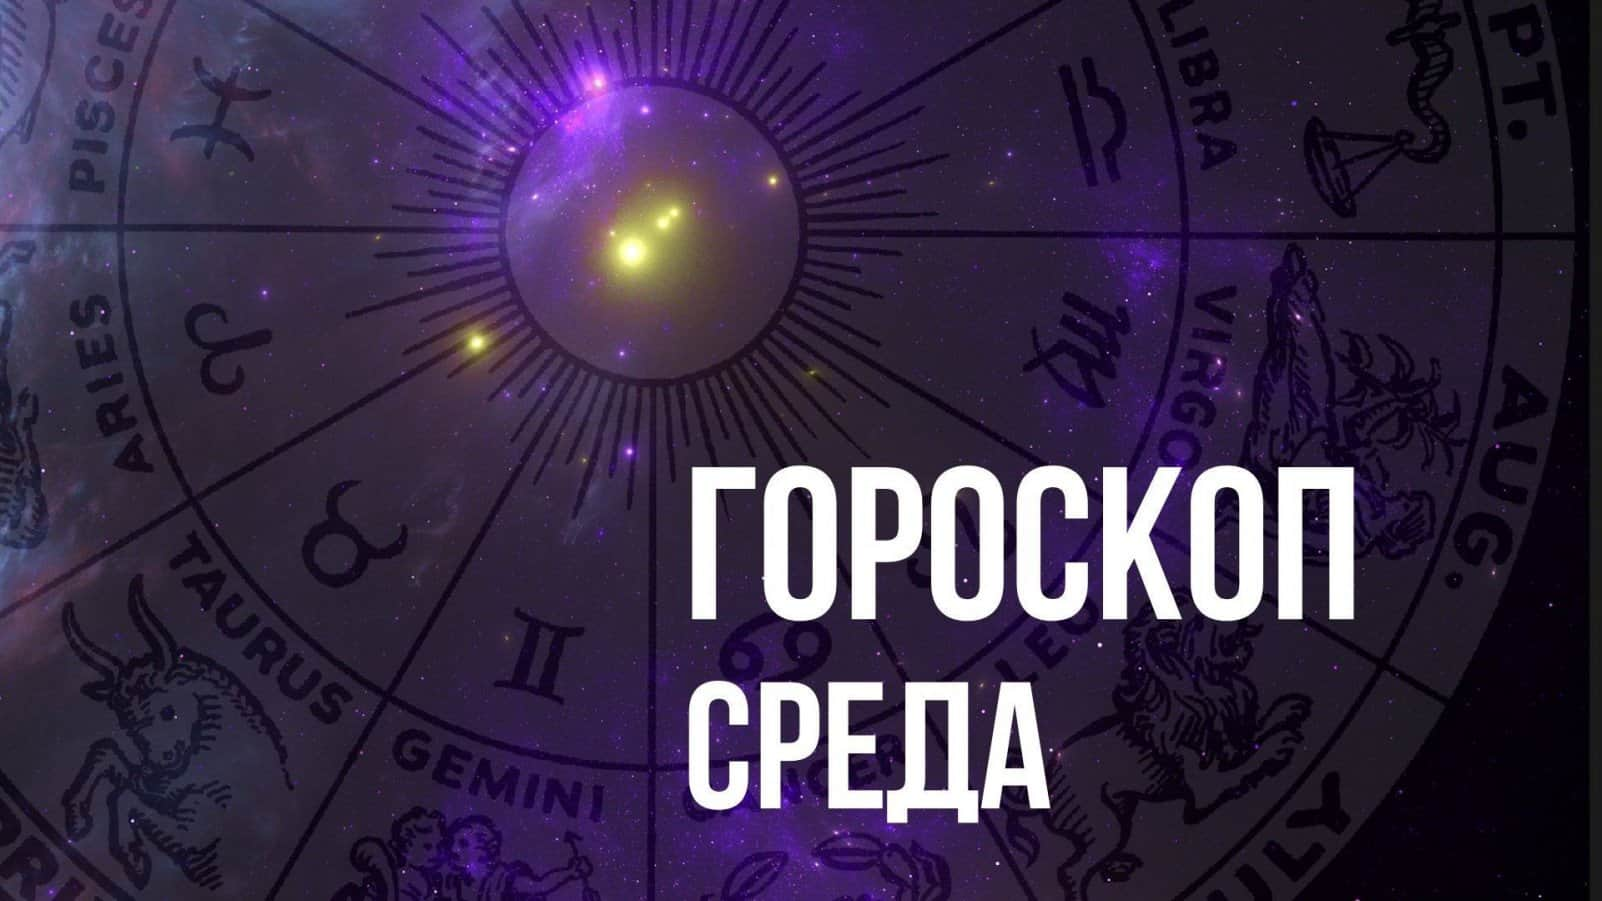 Гороскоп на среду 31 марта для каждого знака Зодиака